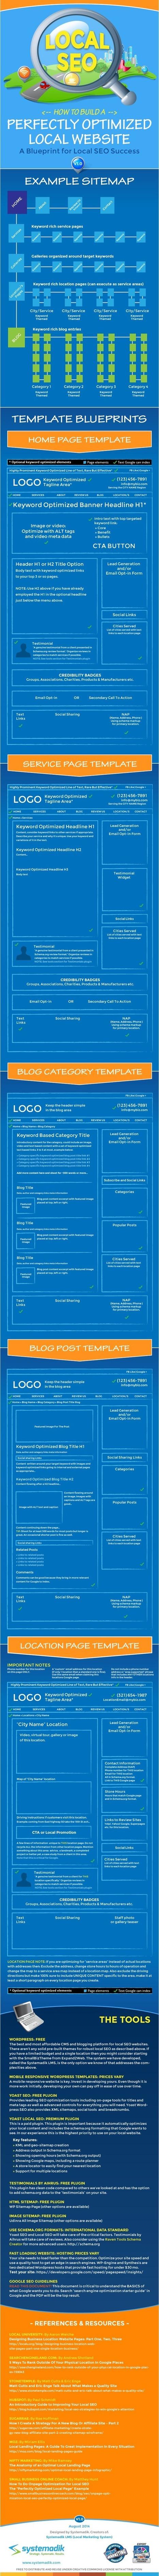 Visual Guide to Local SEO | Les Enjeux du Web Marketing | Scoop.it